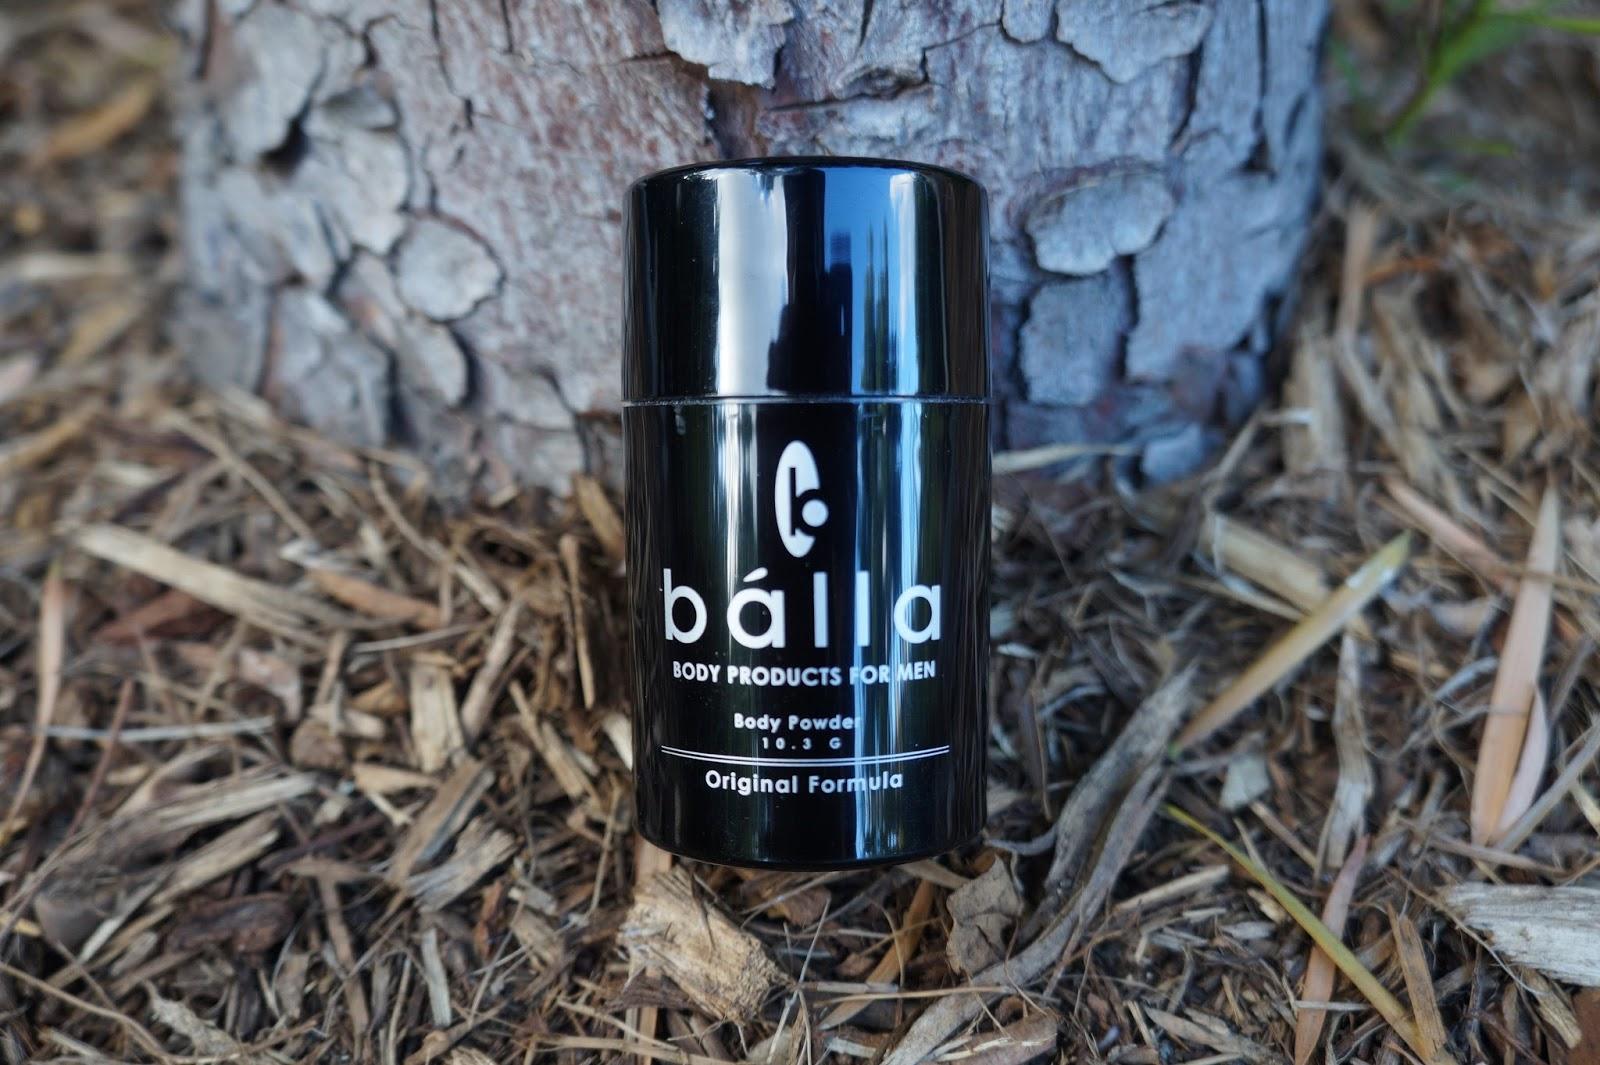 Balla for Men, Body Powder